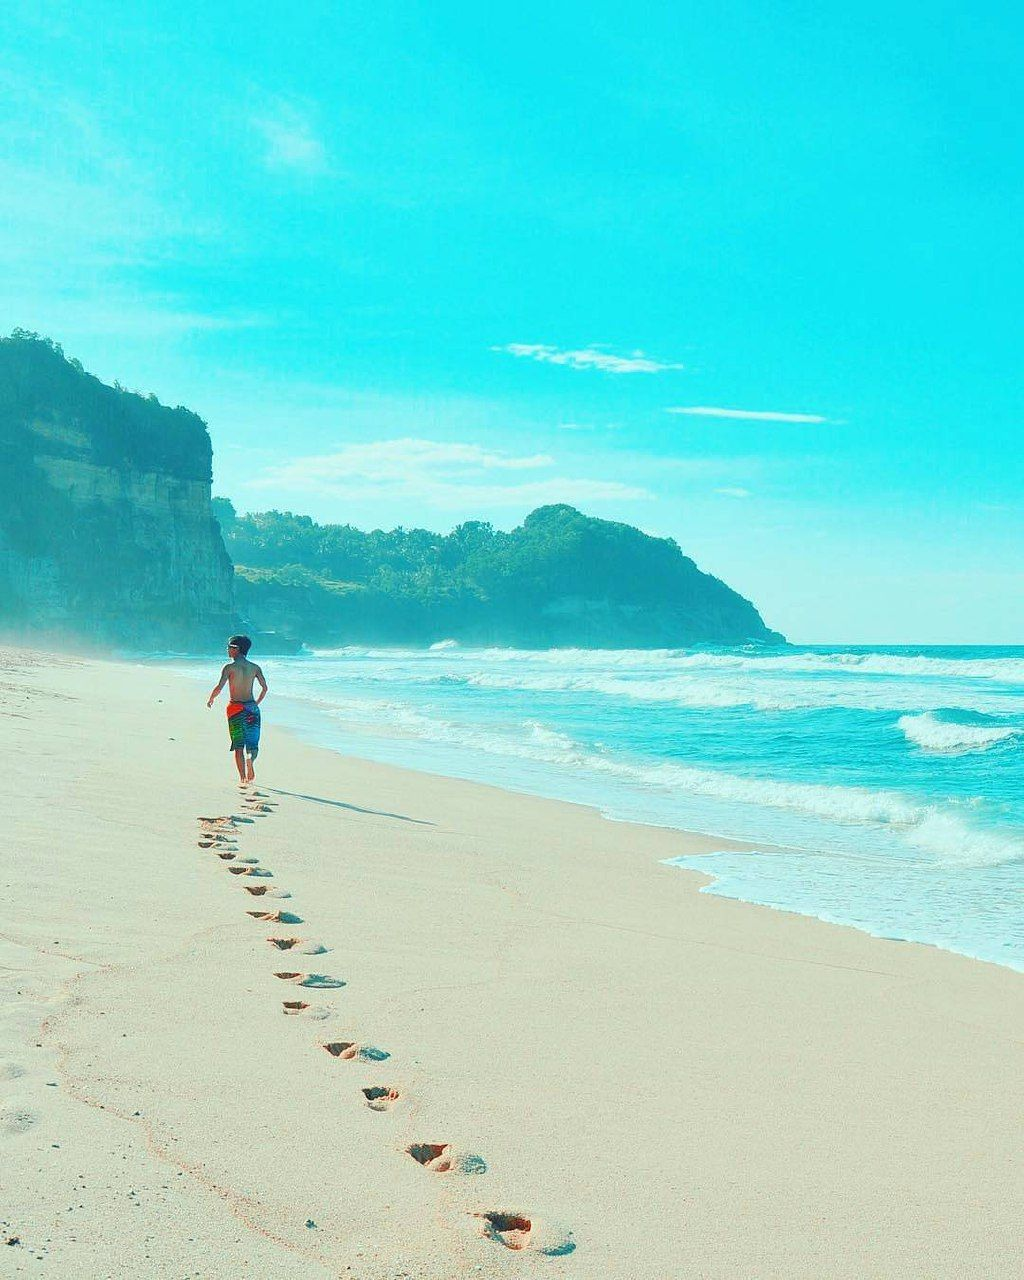 Buyutan Beach A Beautiful Tropical Beach In Pacitan East Java Indonesia Photo By Ig Ariesynthezer Indonesia Beautiful